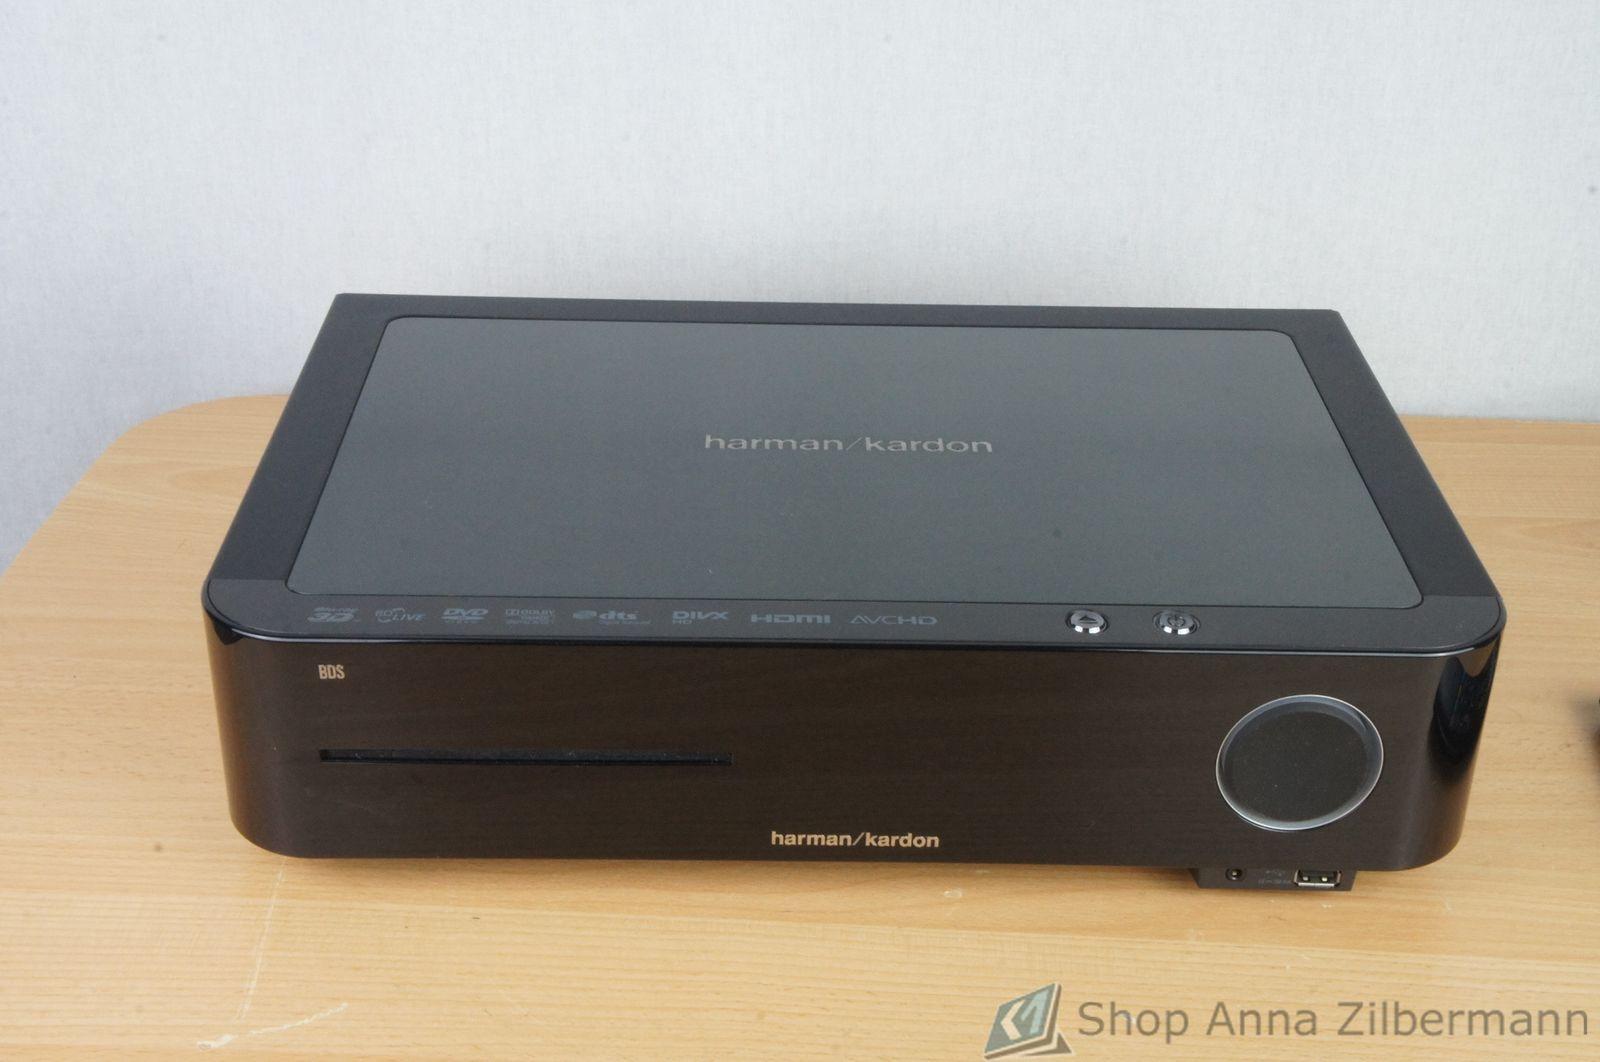 Harman Kardon Bds 270 21 Receiver Blu Ray 21 06 Result Ebay Shop